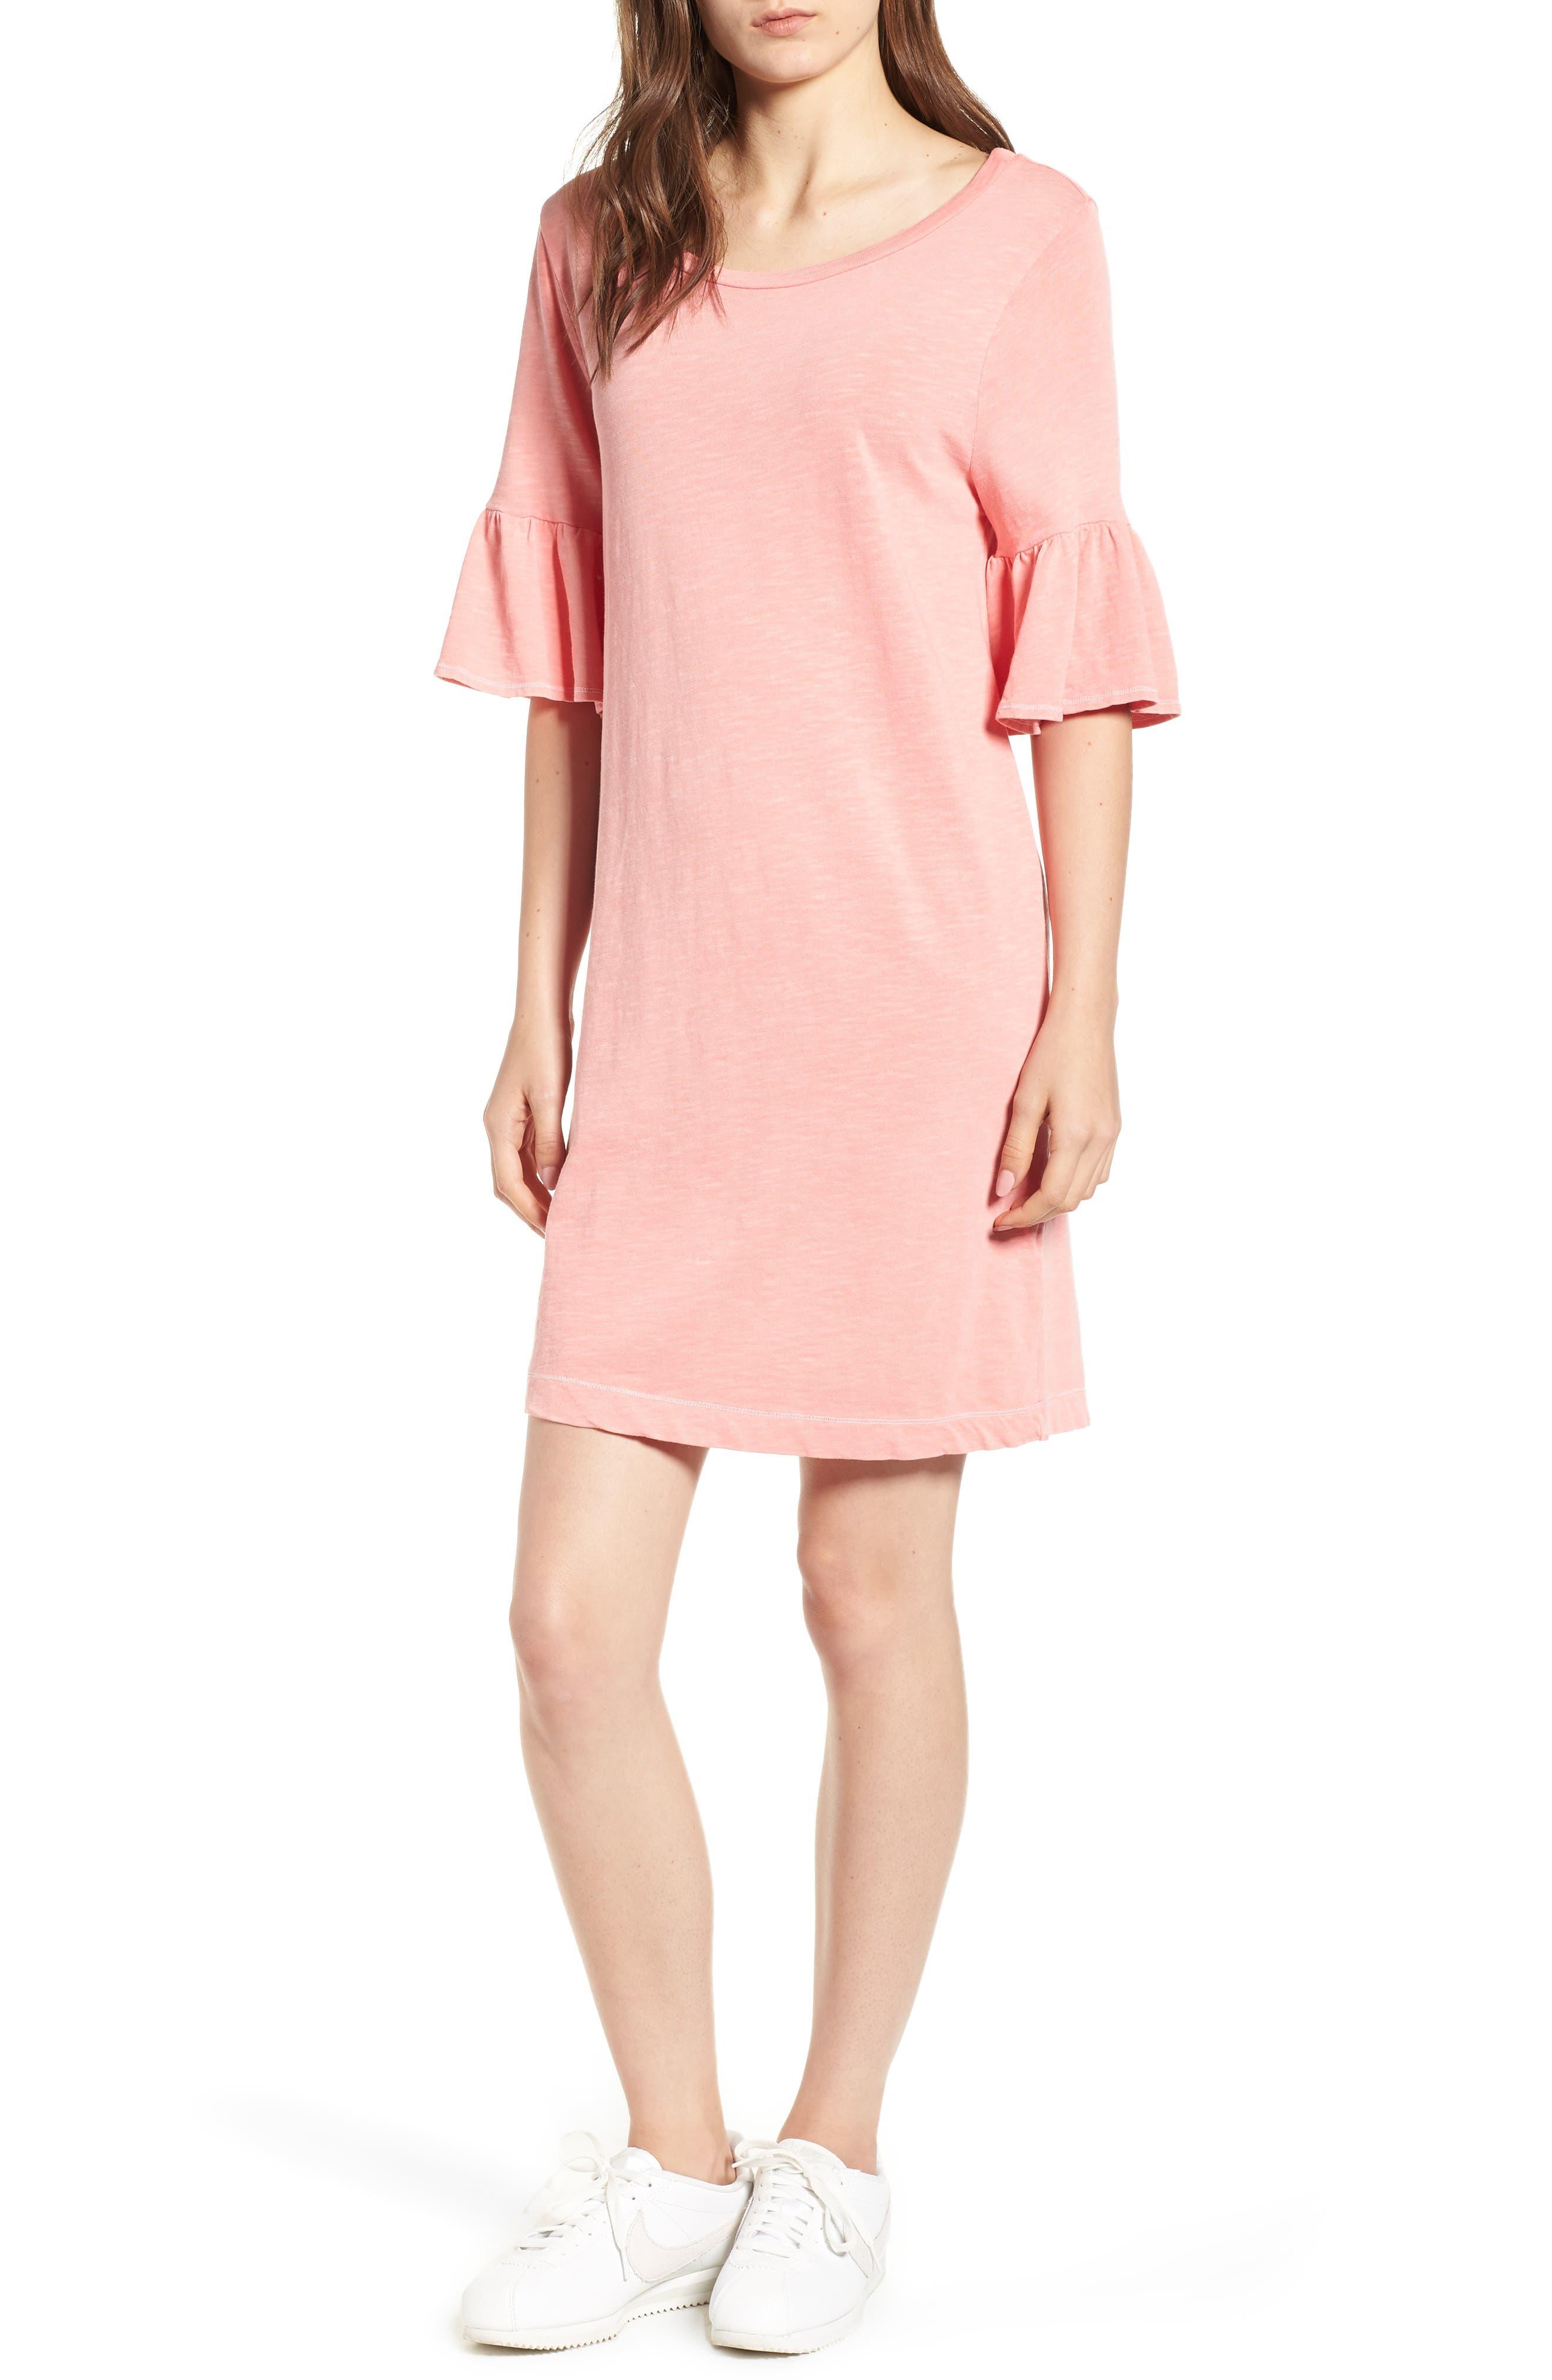 Ruffle Sleeve Shift Dress,                             Main thumbnail 1, color,                             CACTUS FLOWER